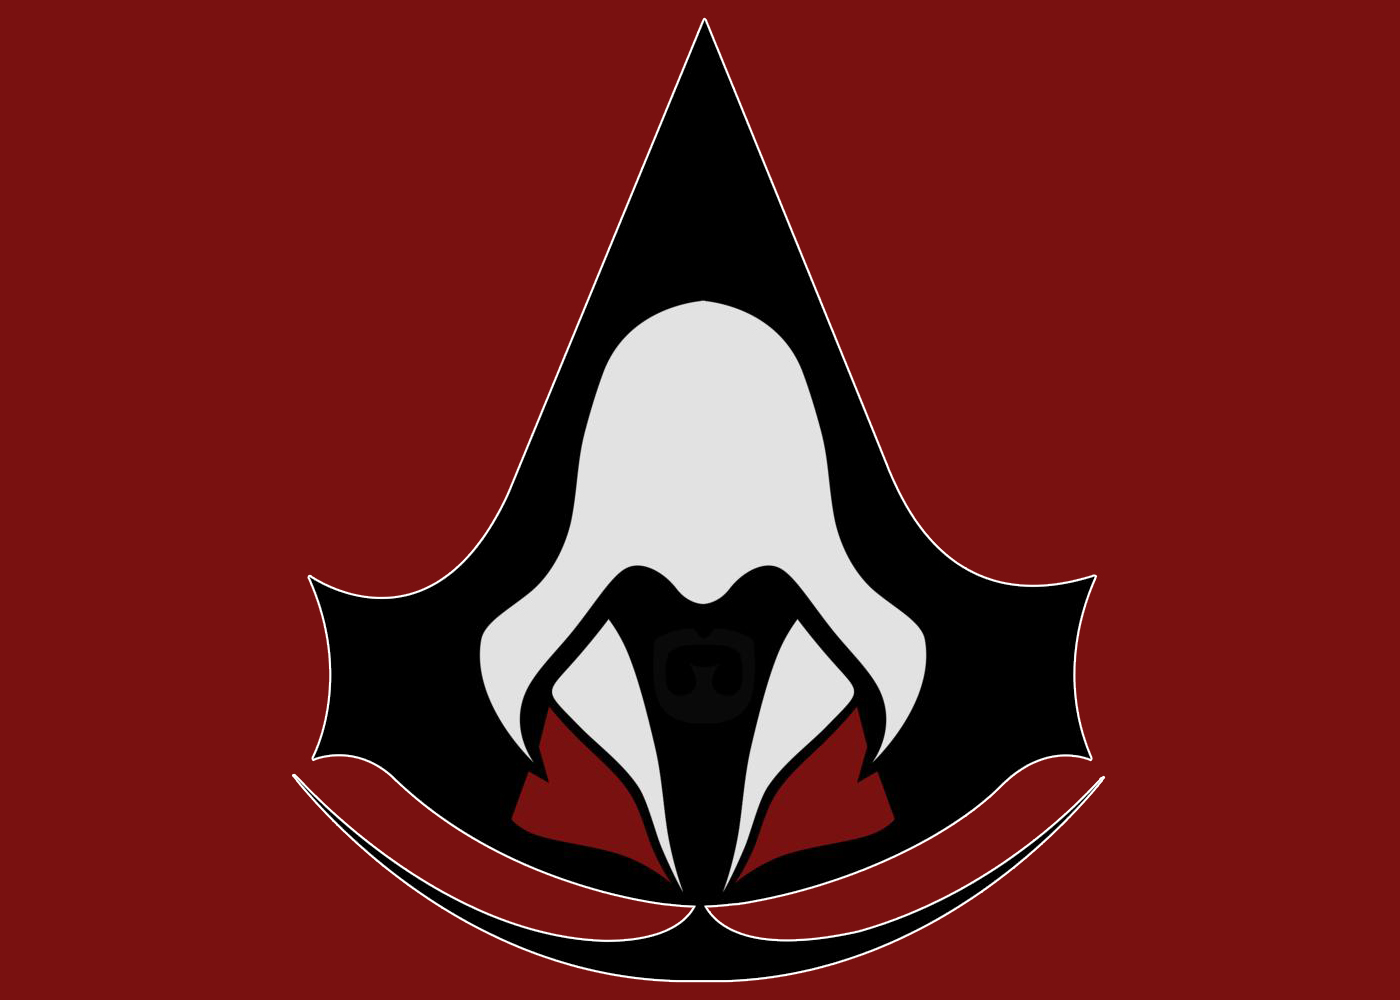 Cool Assassins Creed Logo Wallpapers Titan